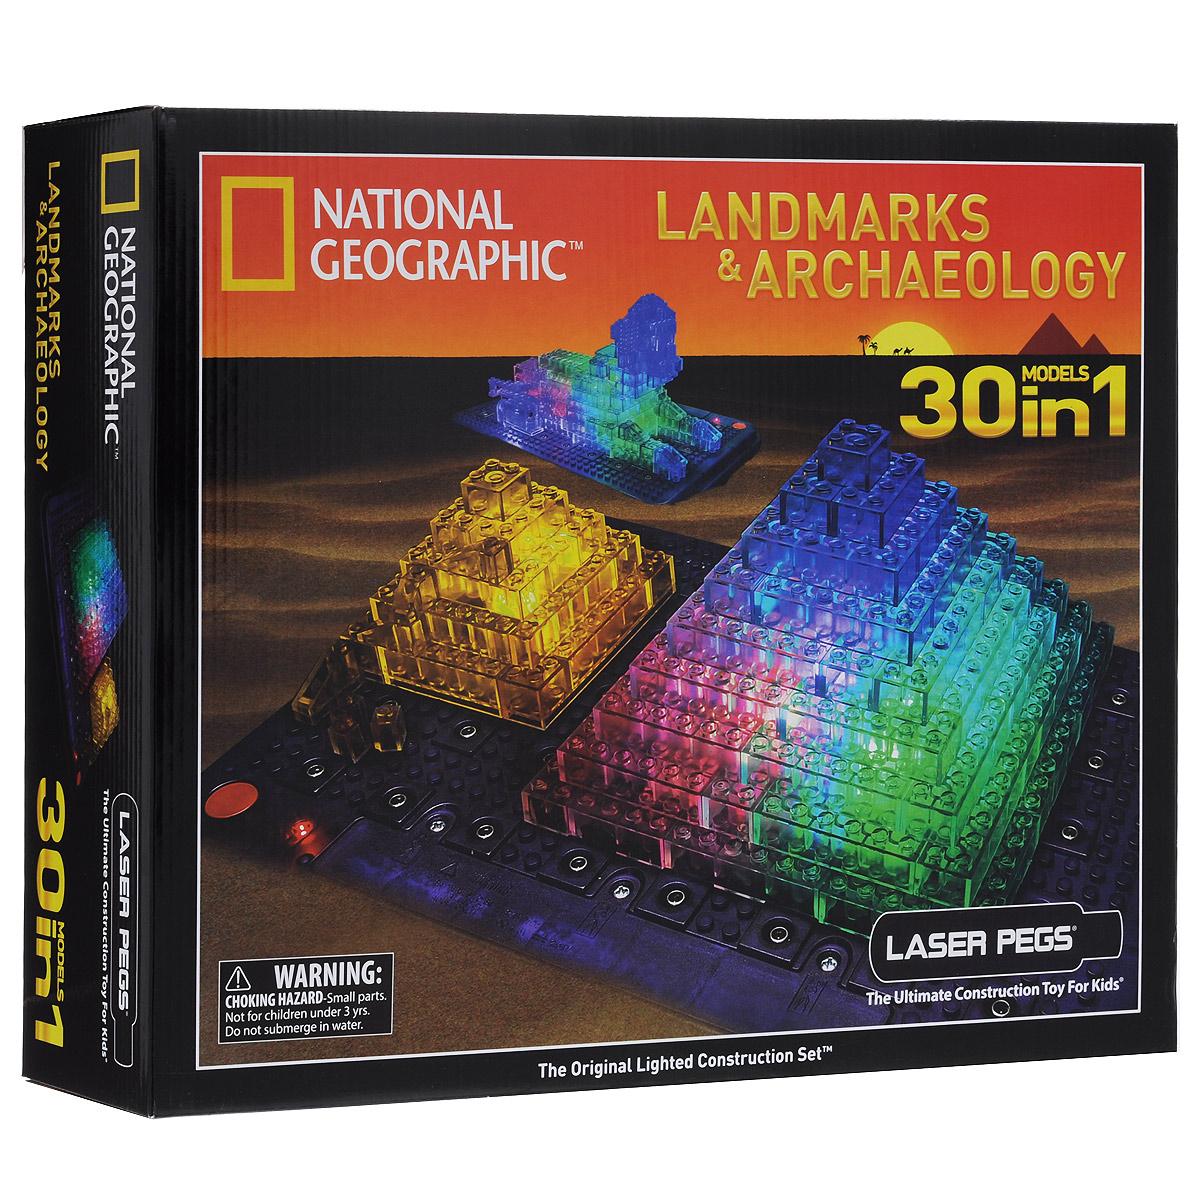 Laser Pegs Конструктор Археология 30 в 1